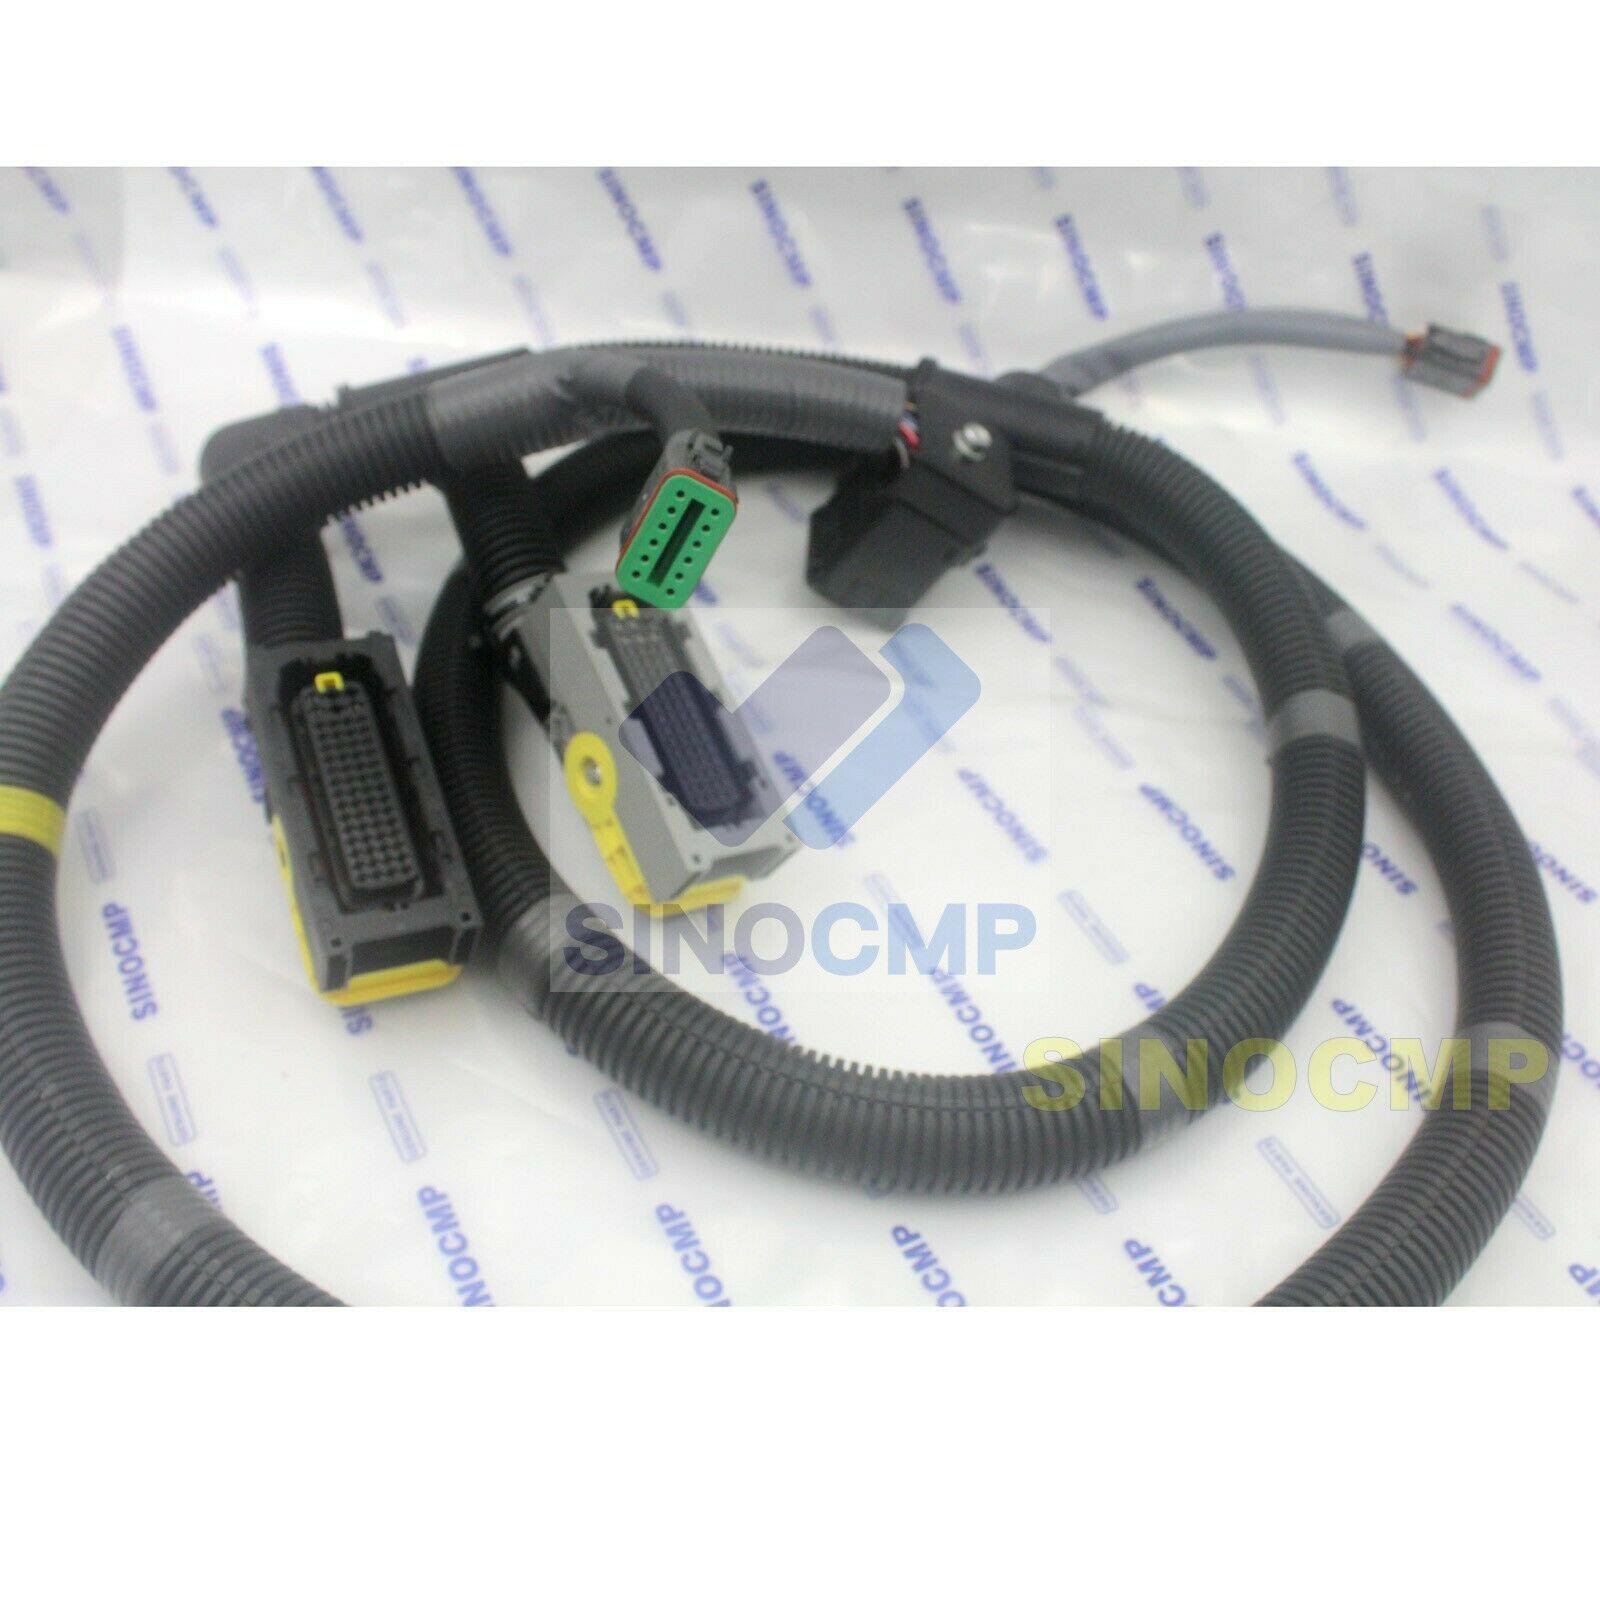 1122-04600 14631794 Wiring Harness For Volvo EC210 EC210B Excavator